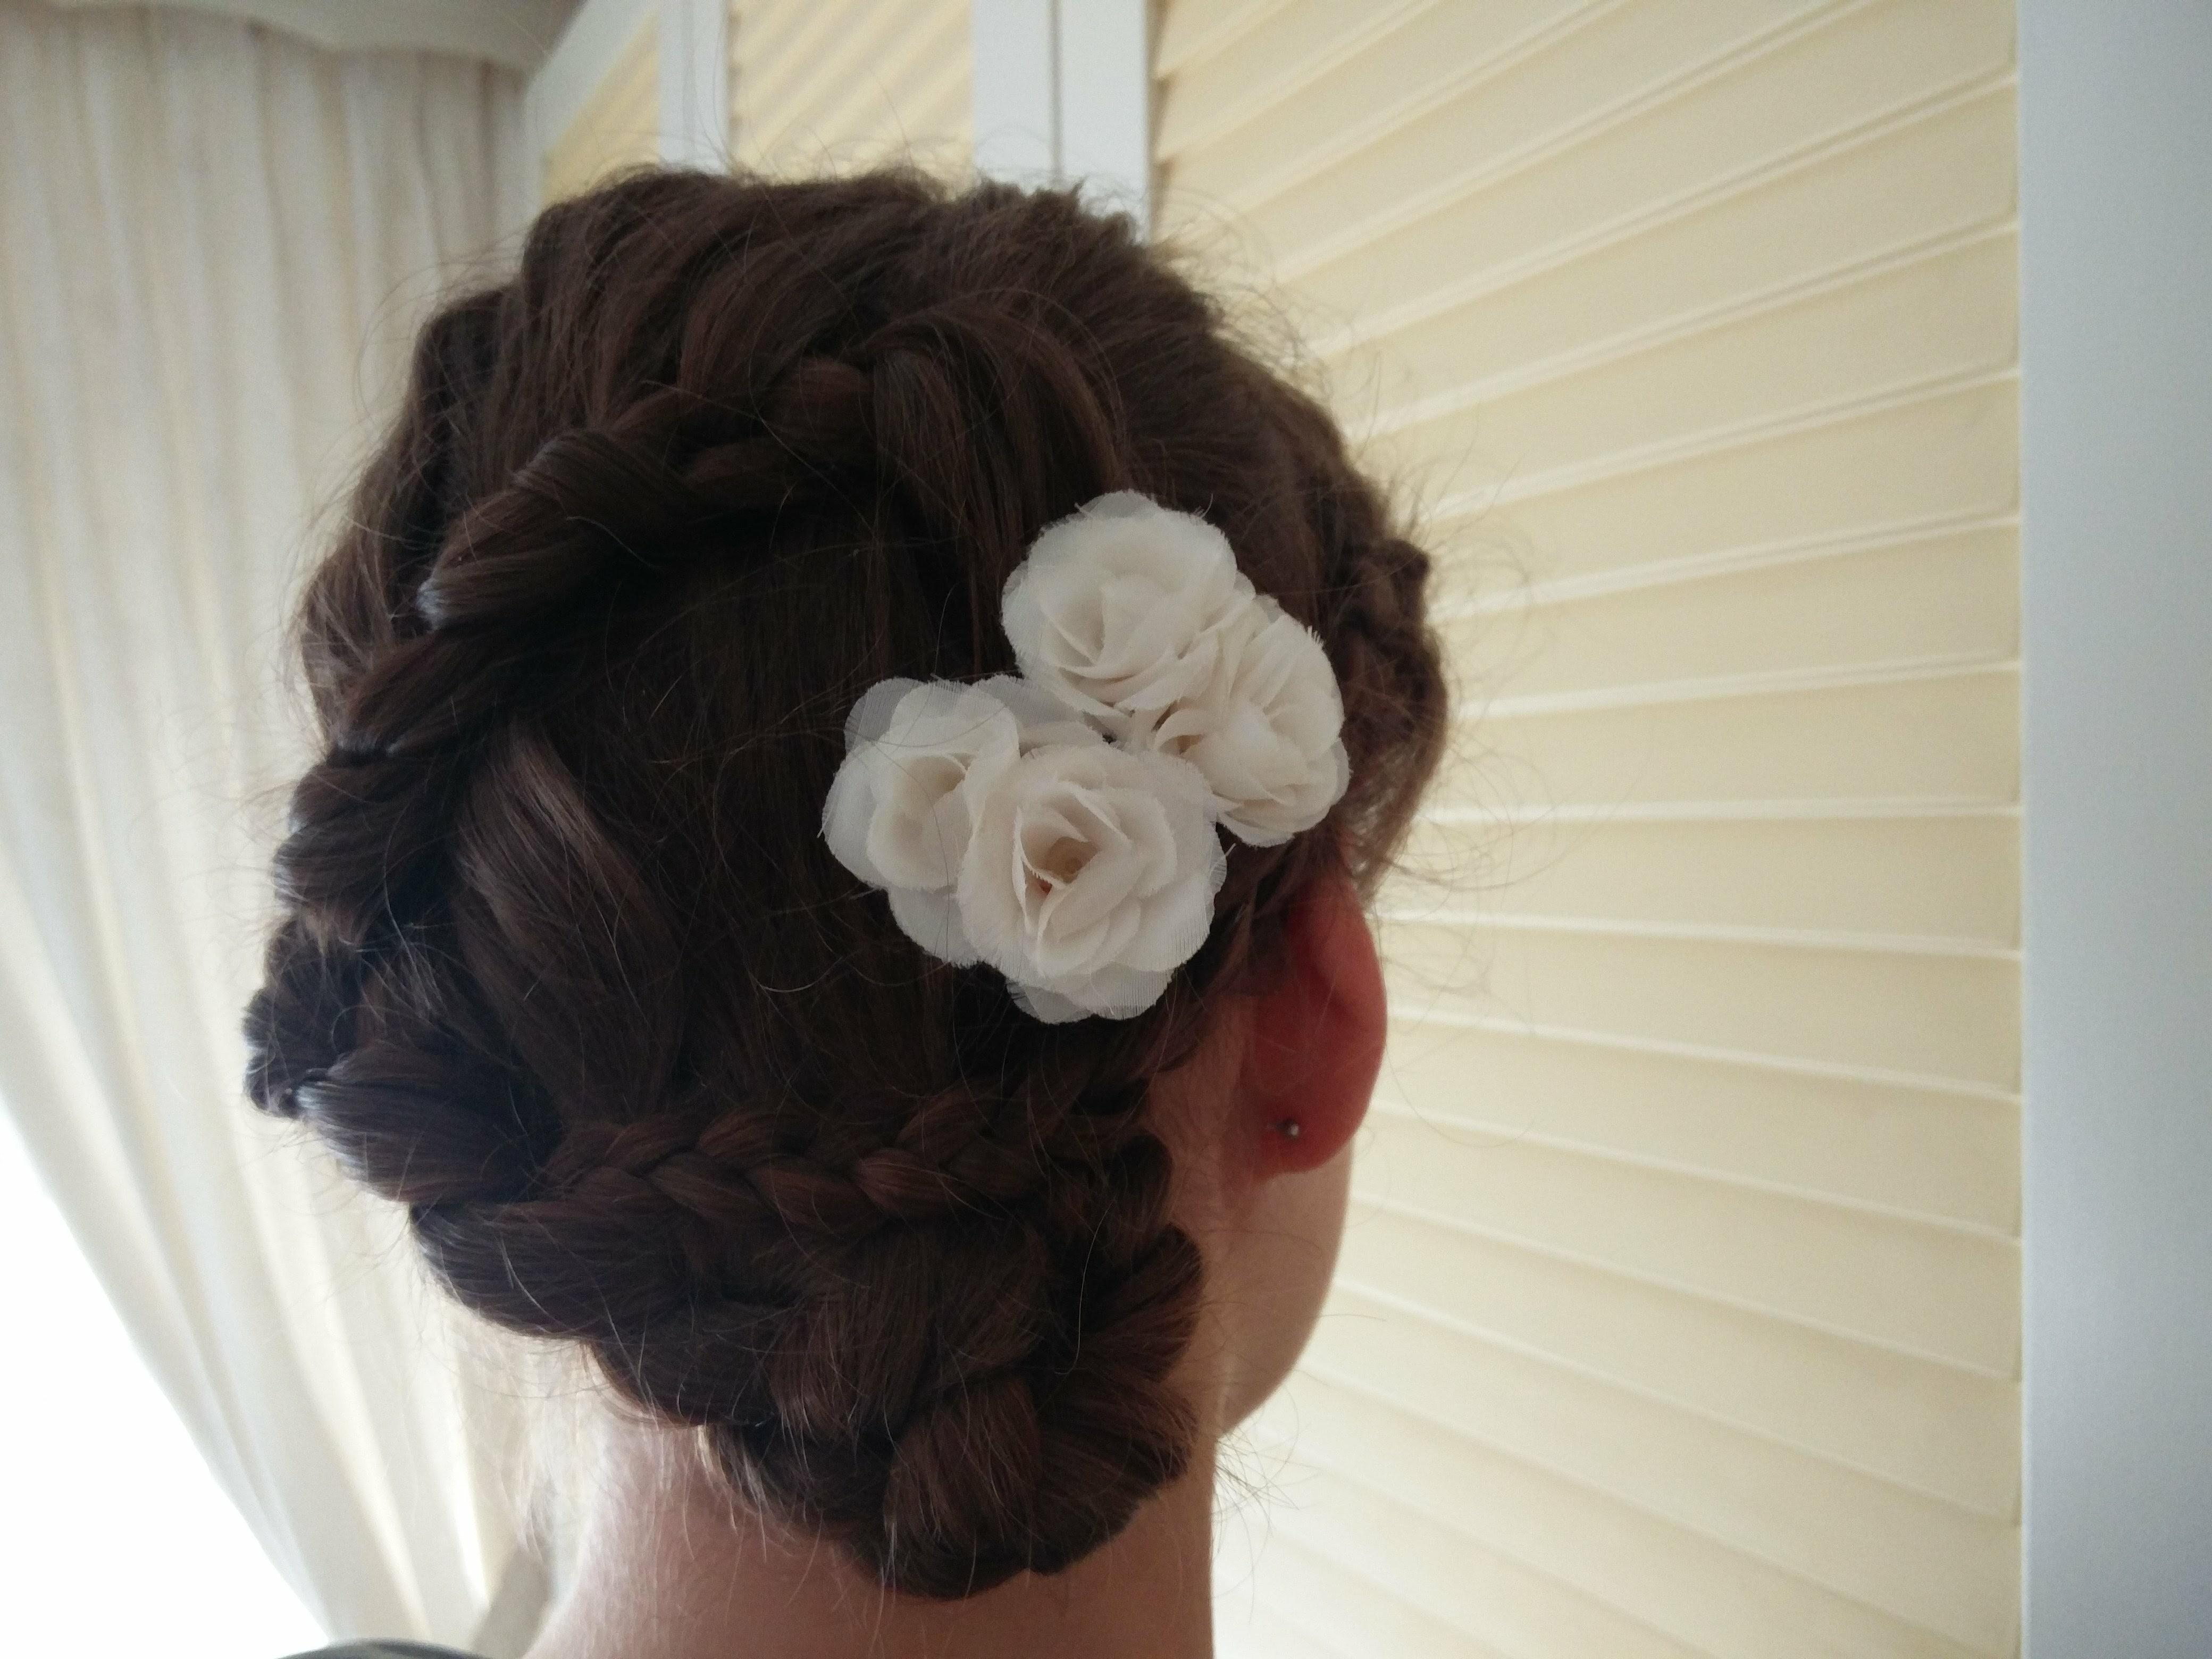 Gevlochten bruidskapsel Linda Petrovic 25022018